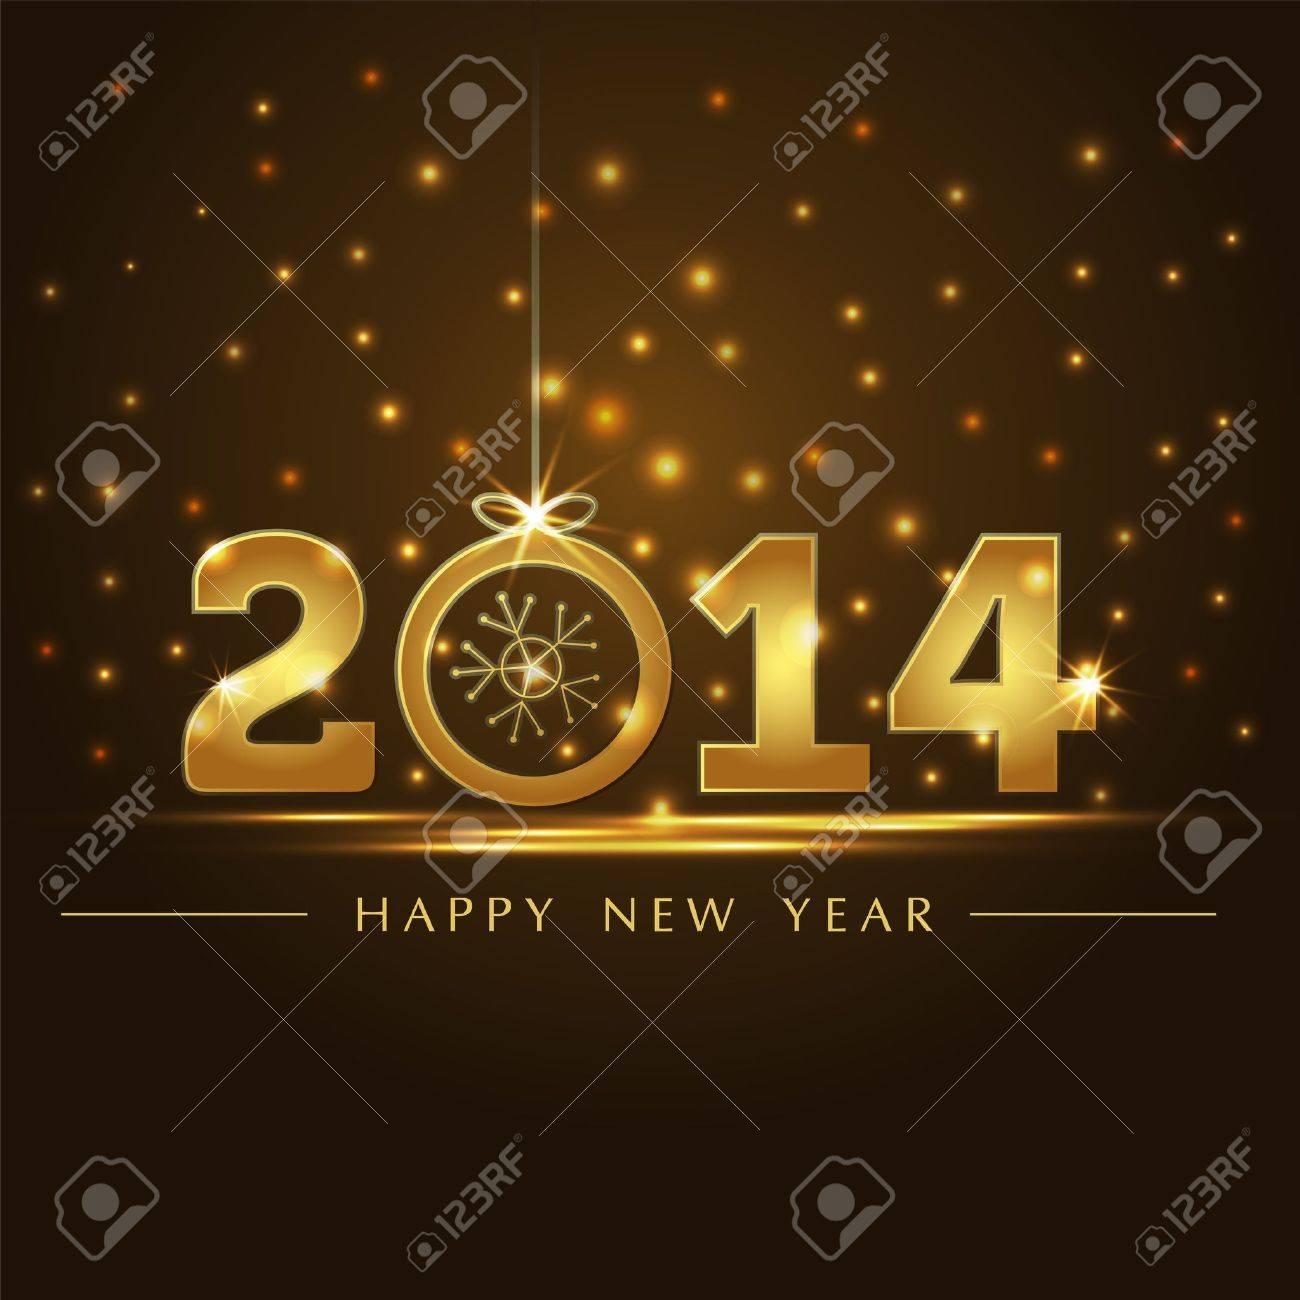 golden 2014 year card presentation - 22035600